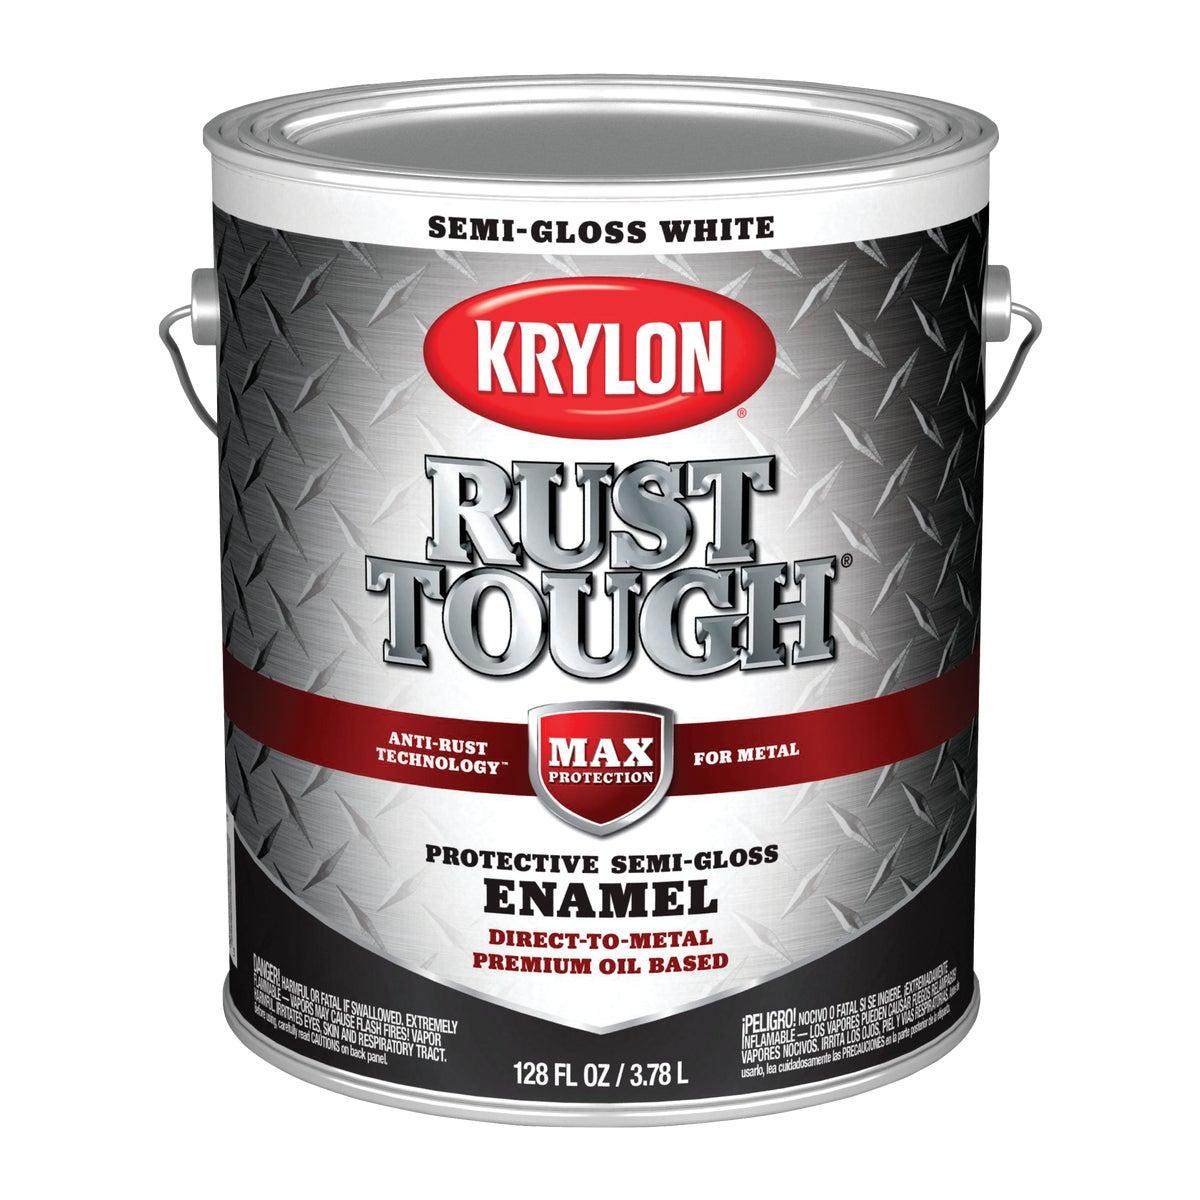 S/G WHITE RUST ENAMEL - 044.0021841.007 by Valspar Corp